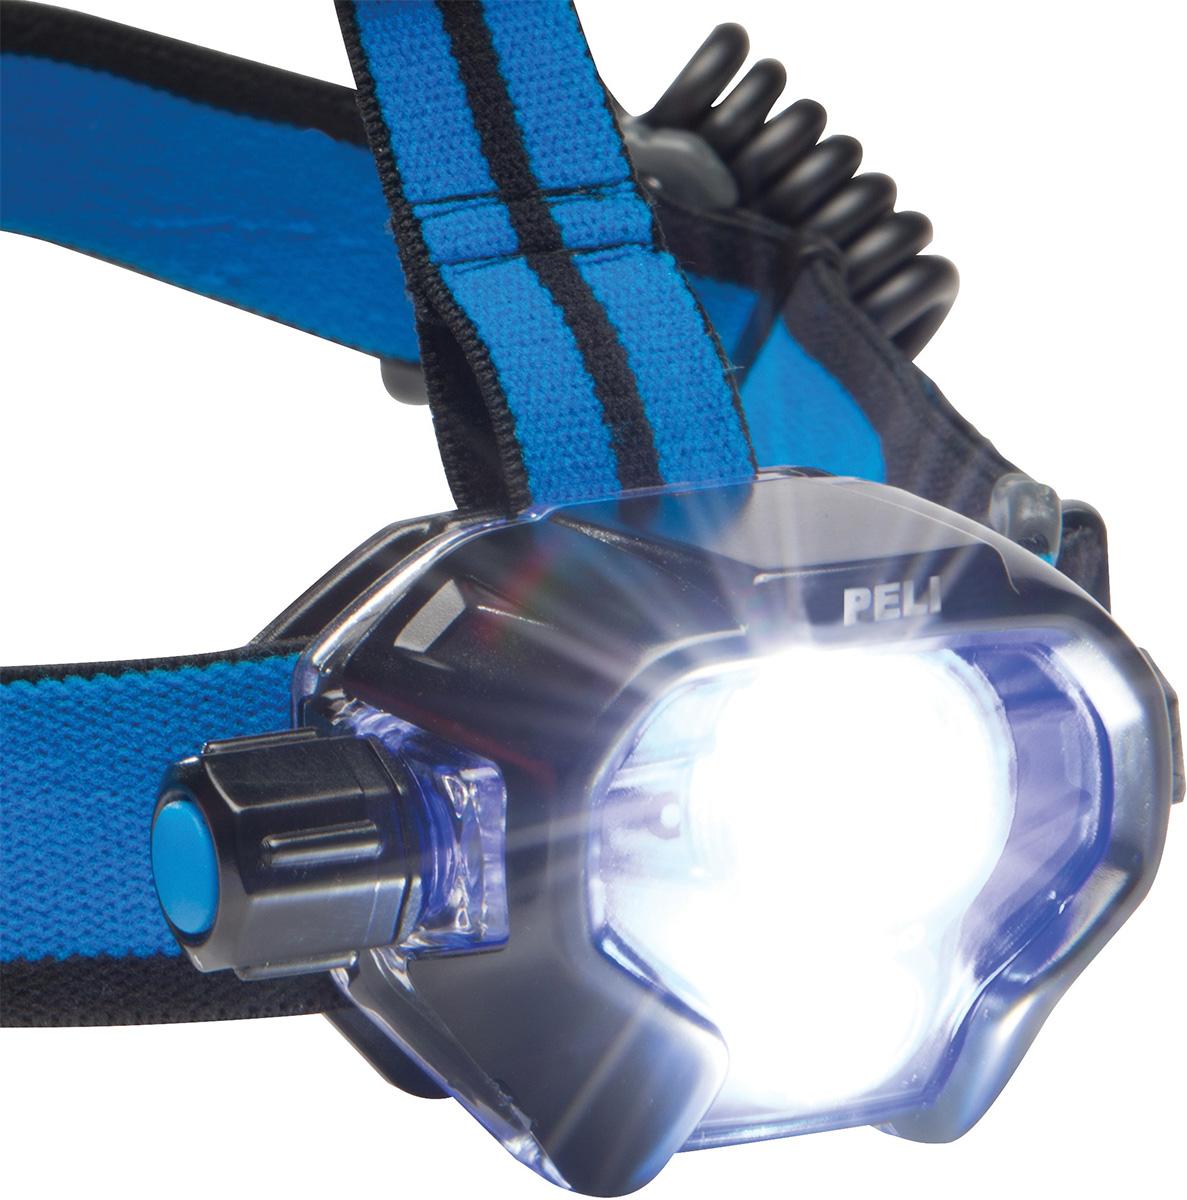 peli rechargeable super bright led headlamp